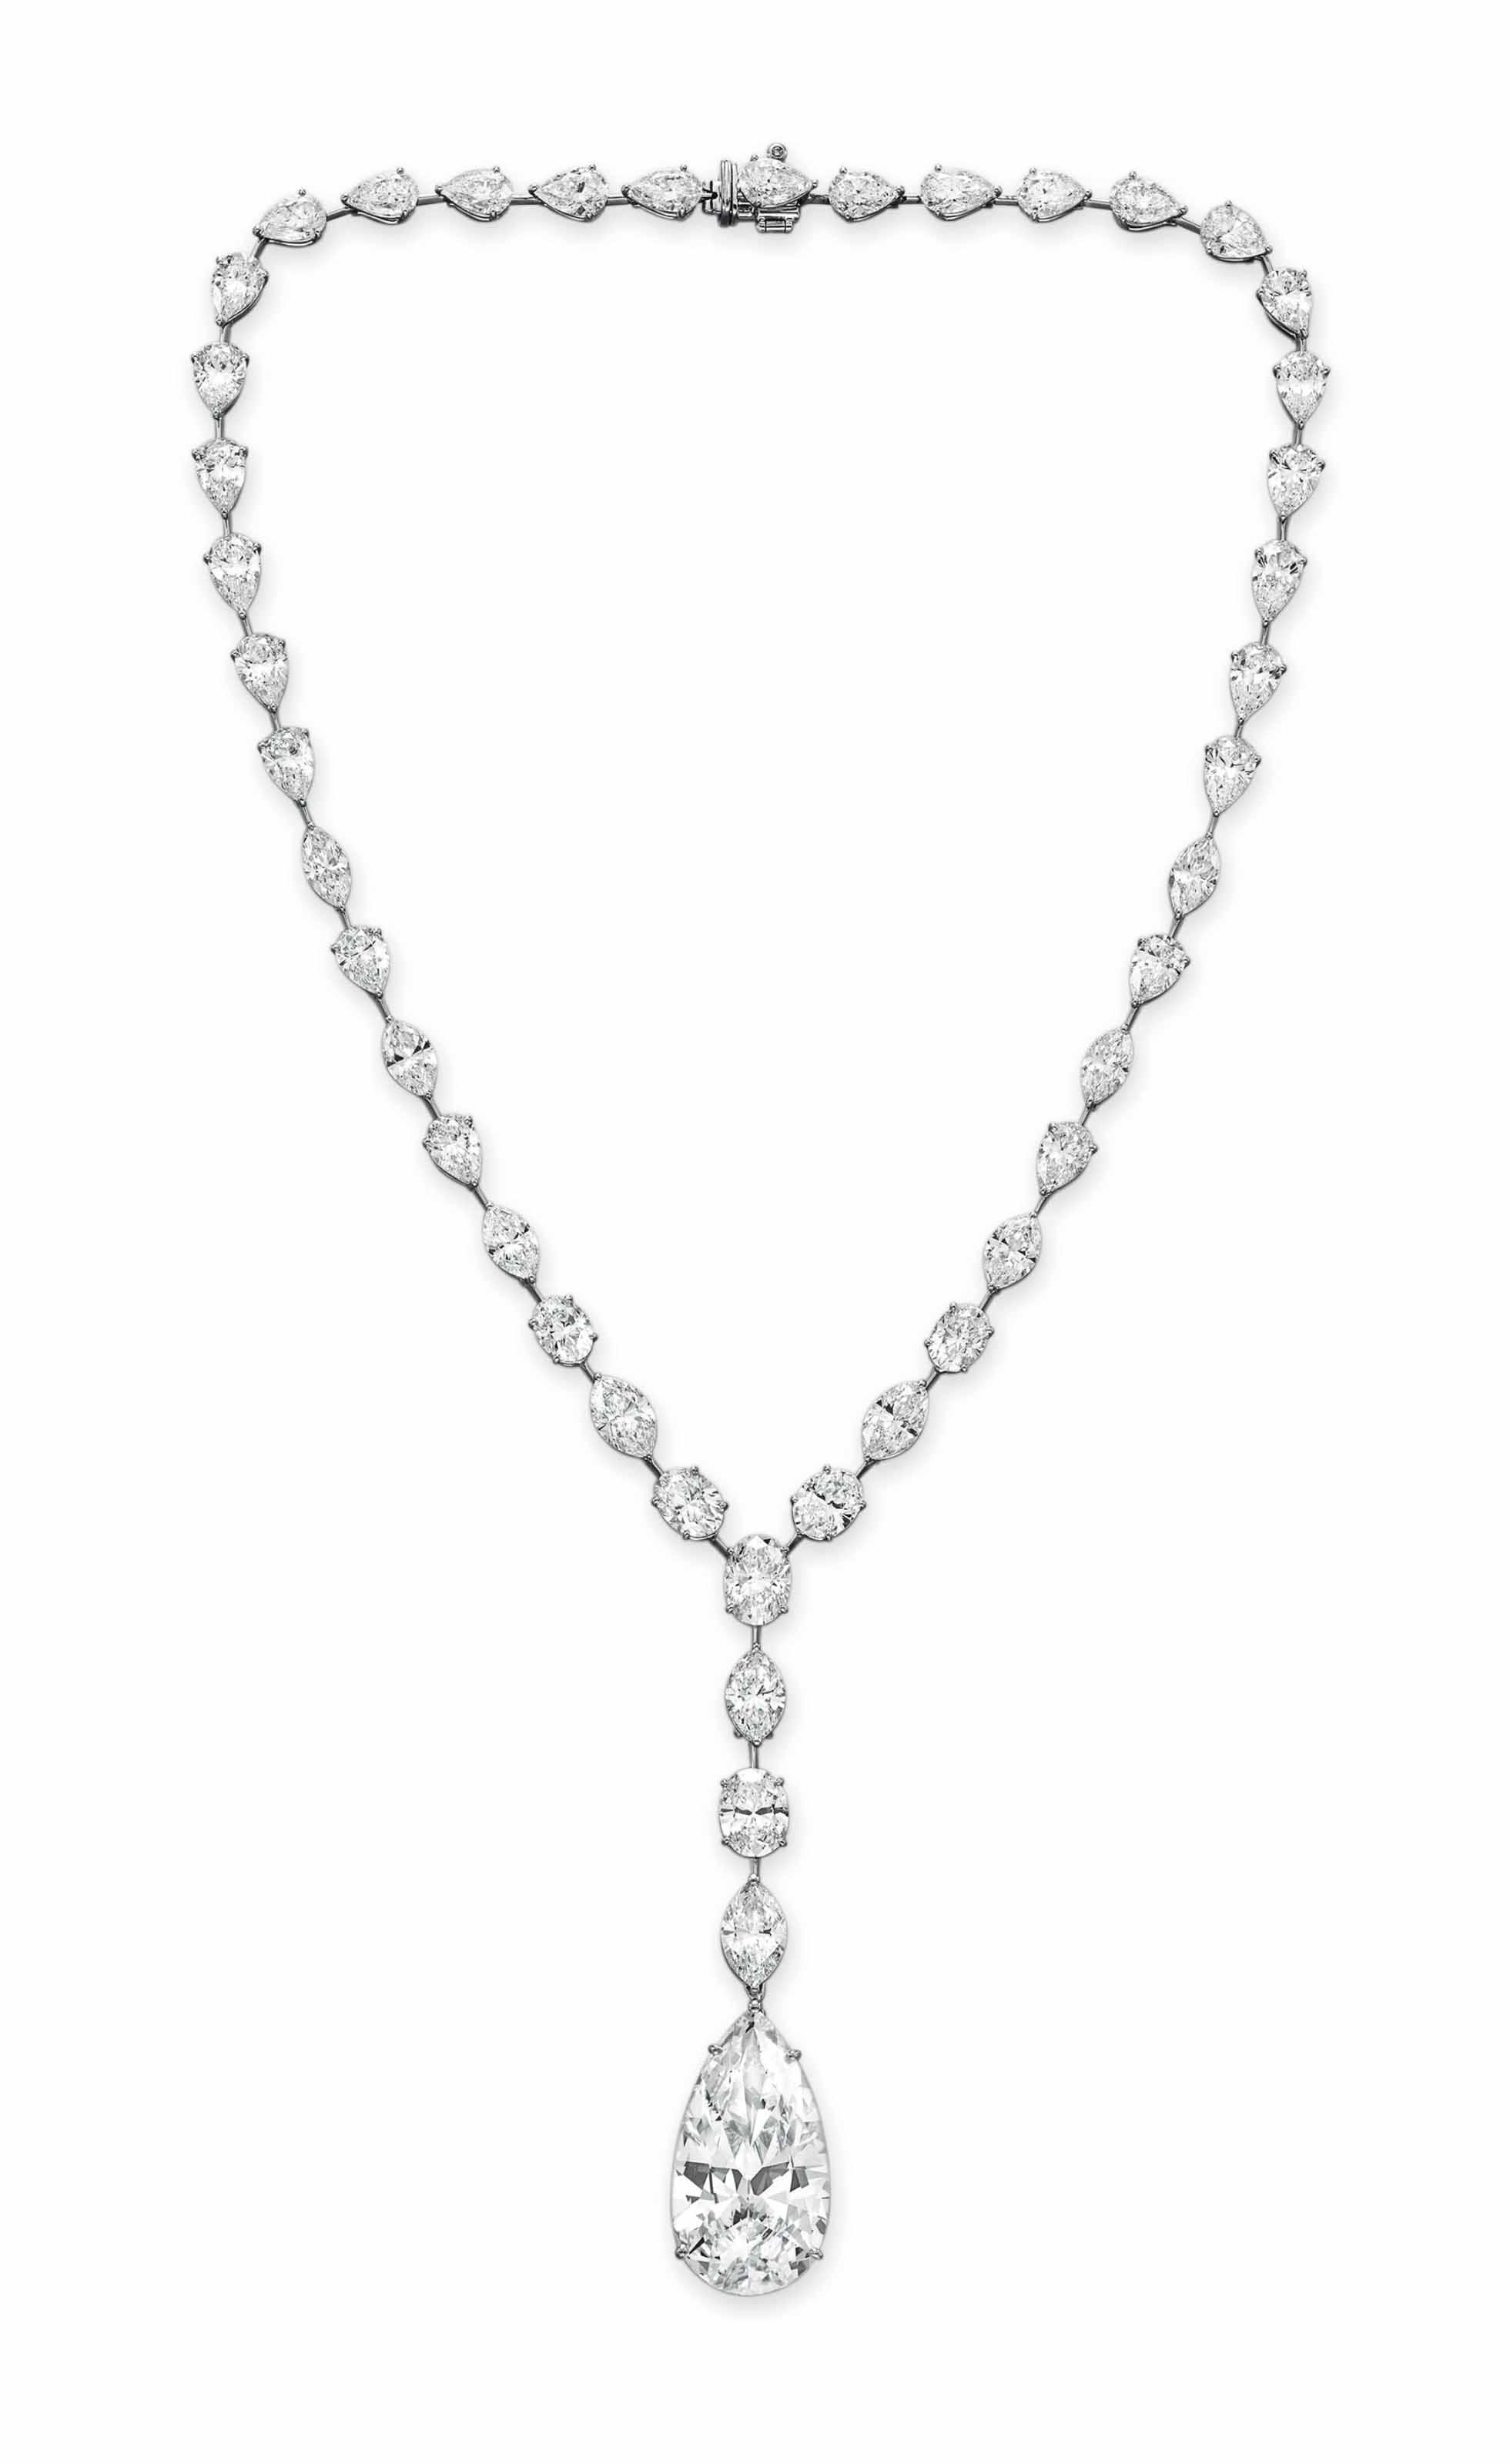 A SUPERB DIAMOND PENDANT NECKLACE, BY LEVIEV